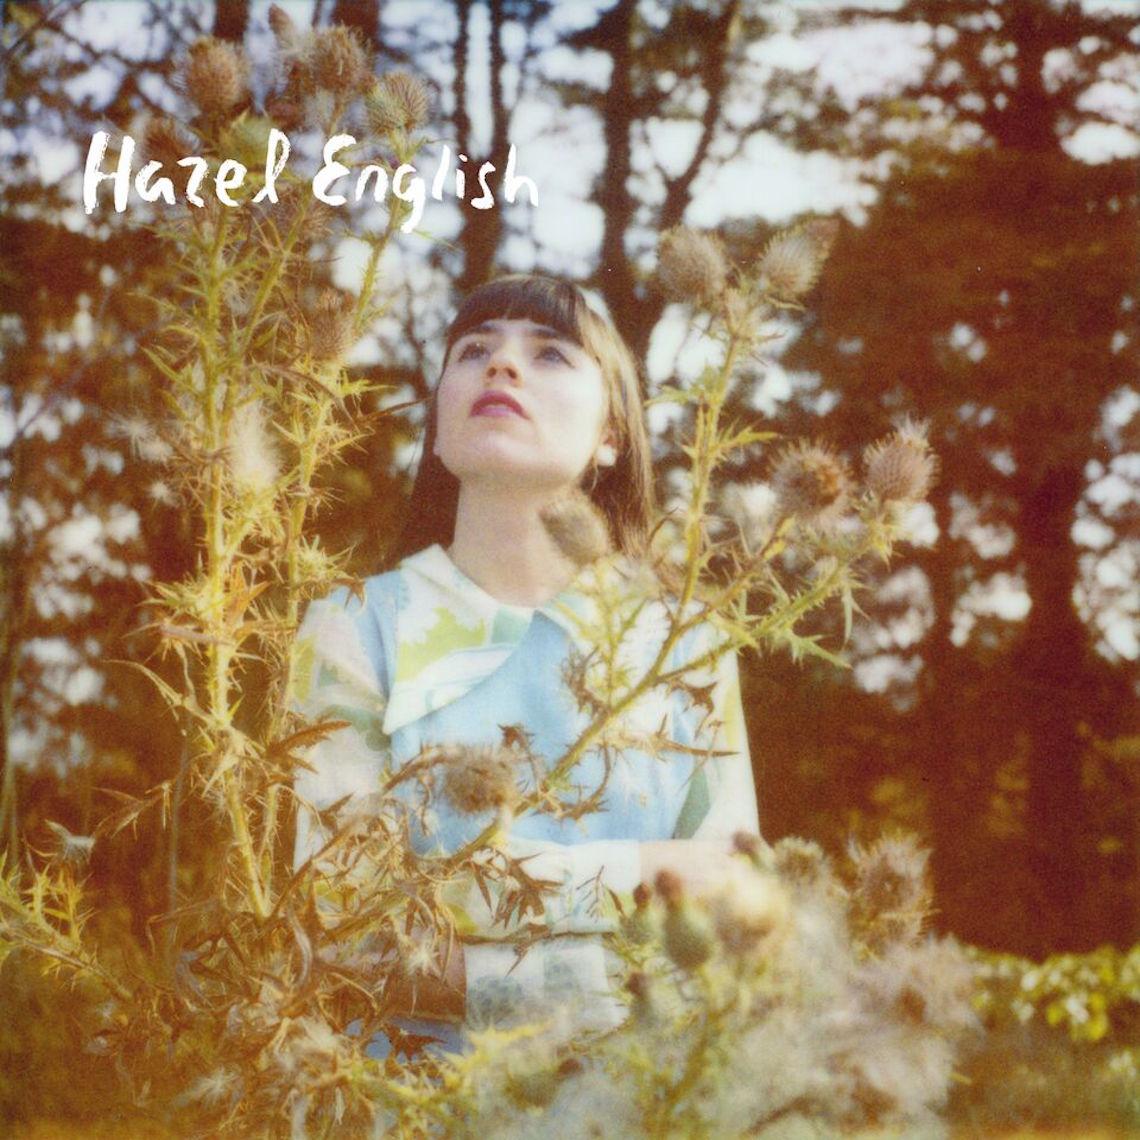 Hazel English